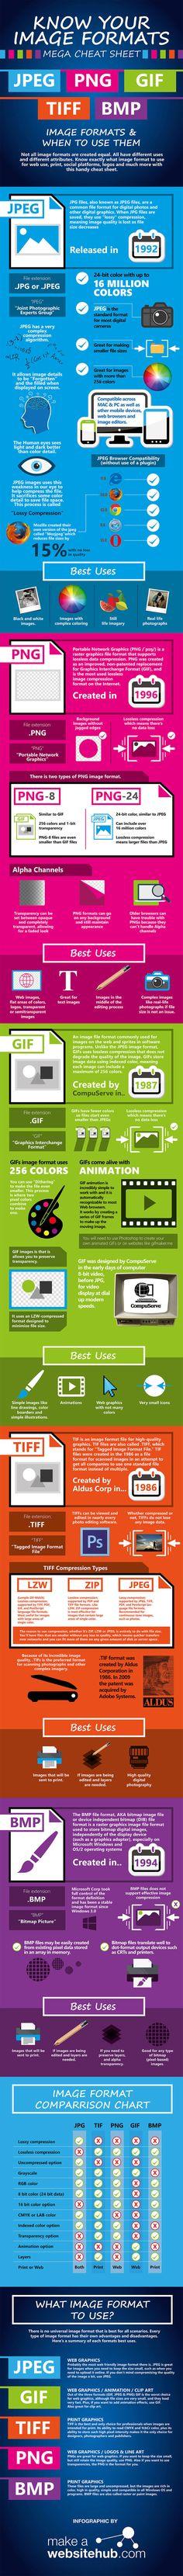 Formats graphiques, Explications et conseils... http://iwebcontact.ca/formats-images/